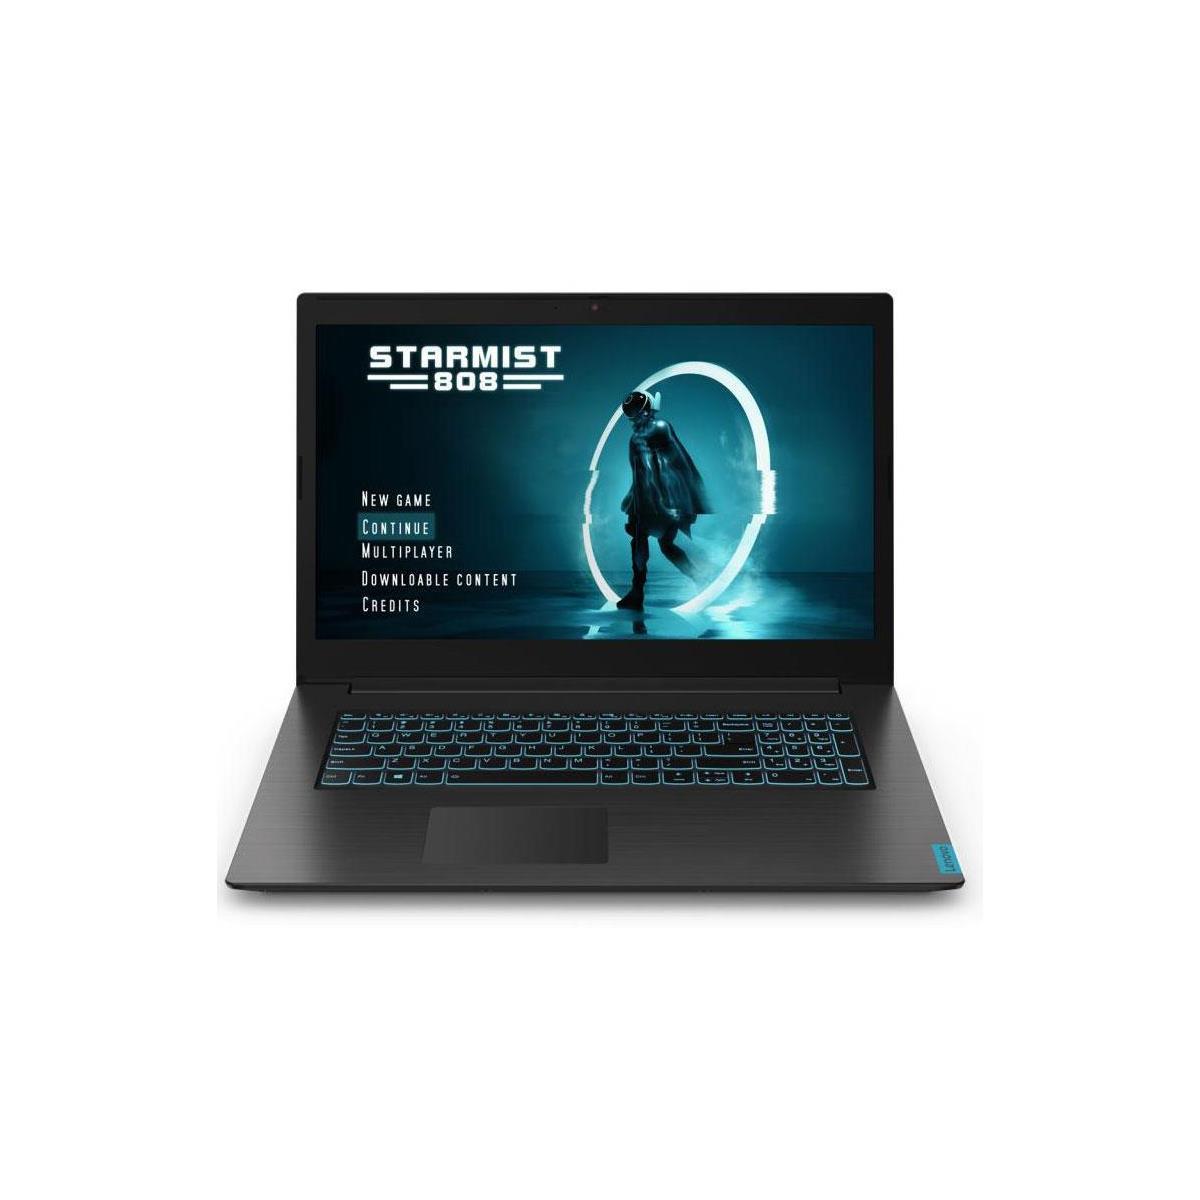 "Lenovo IdeaPad L340 15.6"" Full HD Gaming Notebook Computer, Intel Core i7-9750H 2.60GHz, 8GB RAM, 256GB SSD, NVIDIA GeForce GTX 1050 3GB, Windows 10 Home"